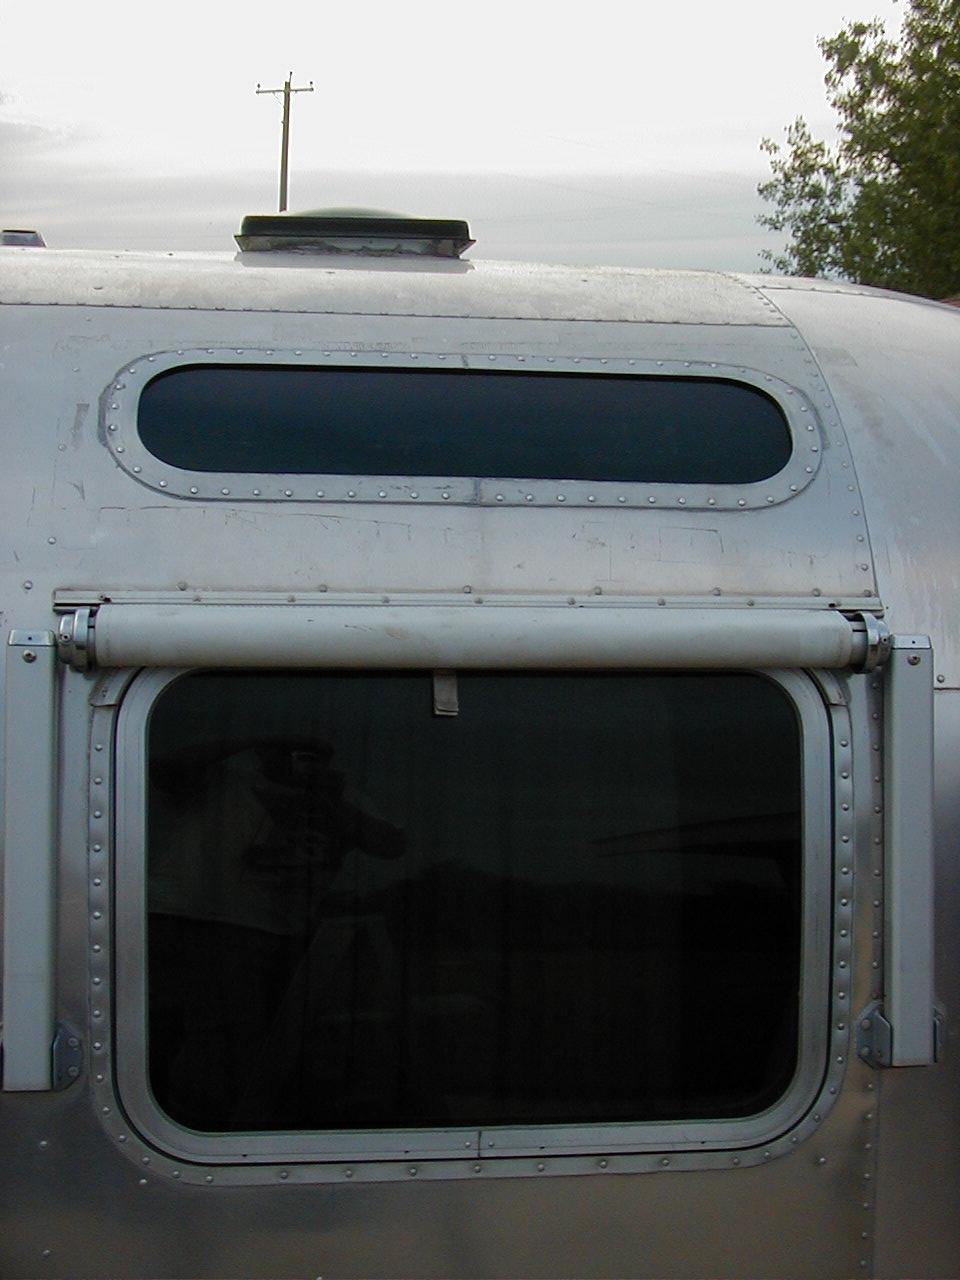 Click image for larger version  Name:Airstream vista repair 012.jpg Views:201 Size:165.2 KB ID:162610